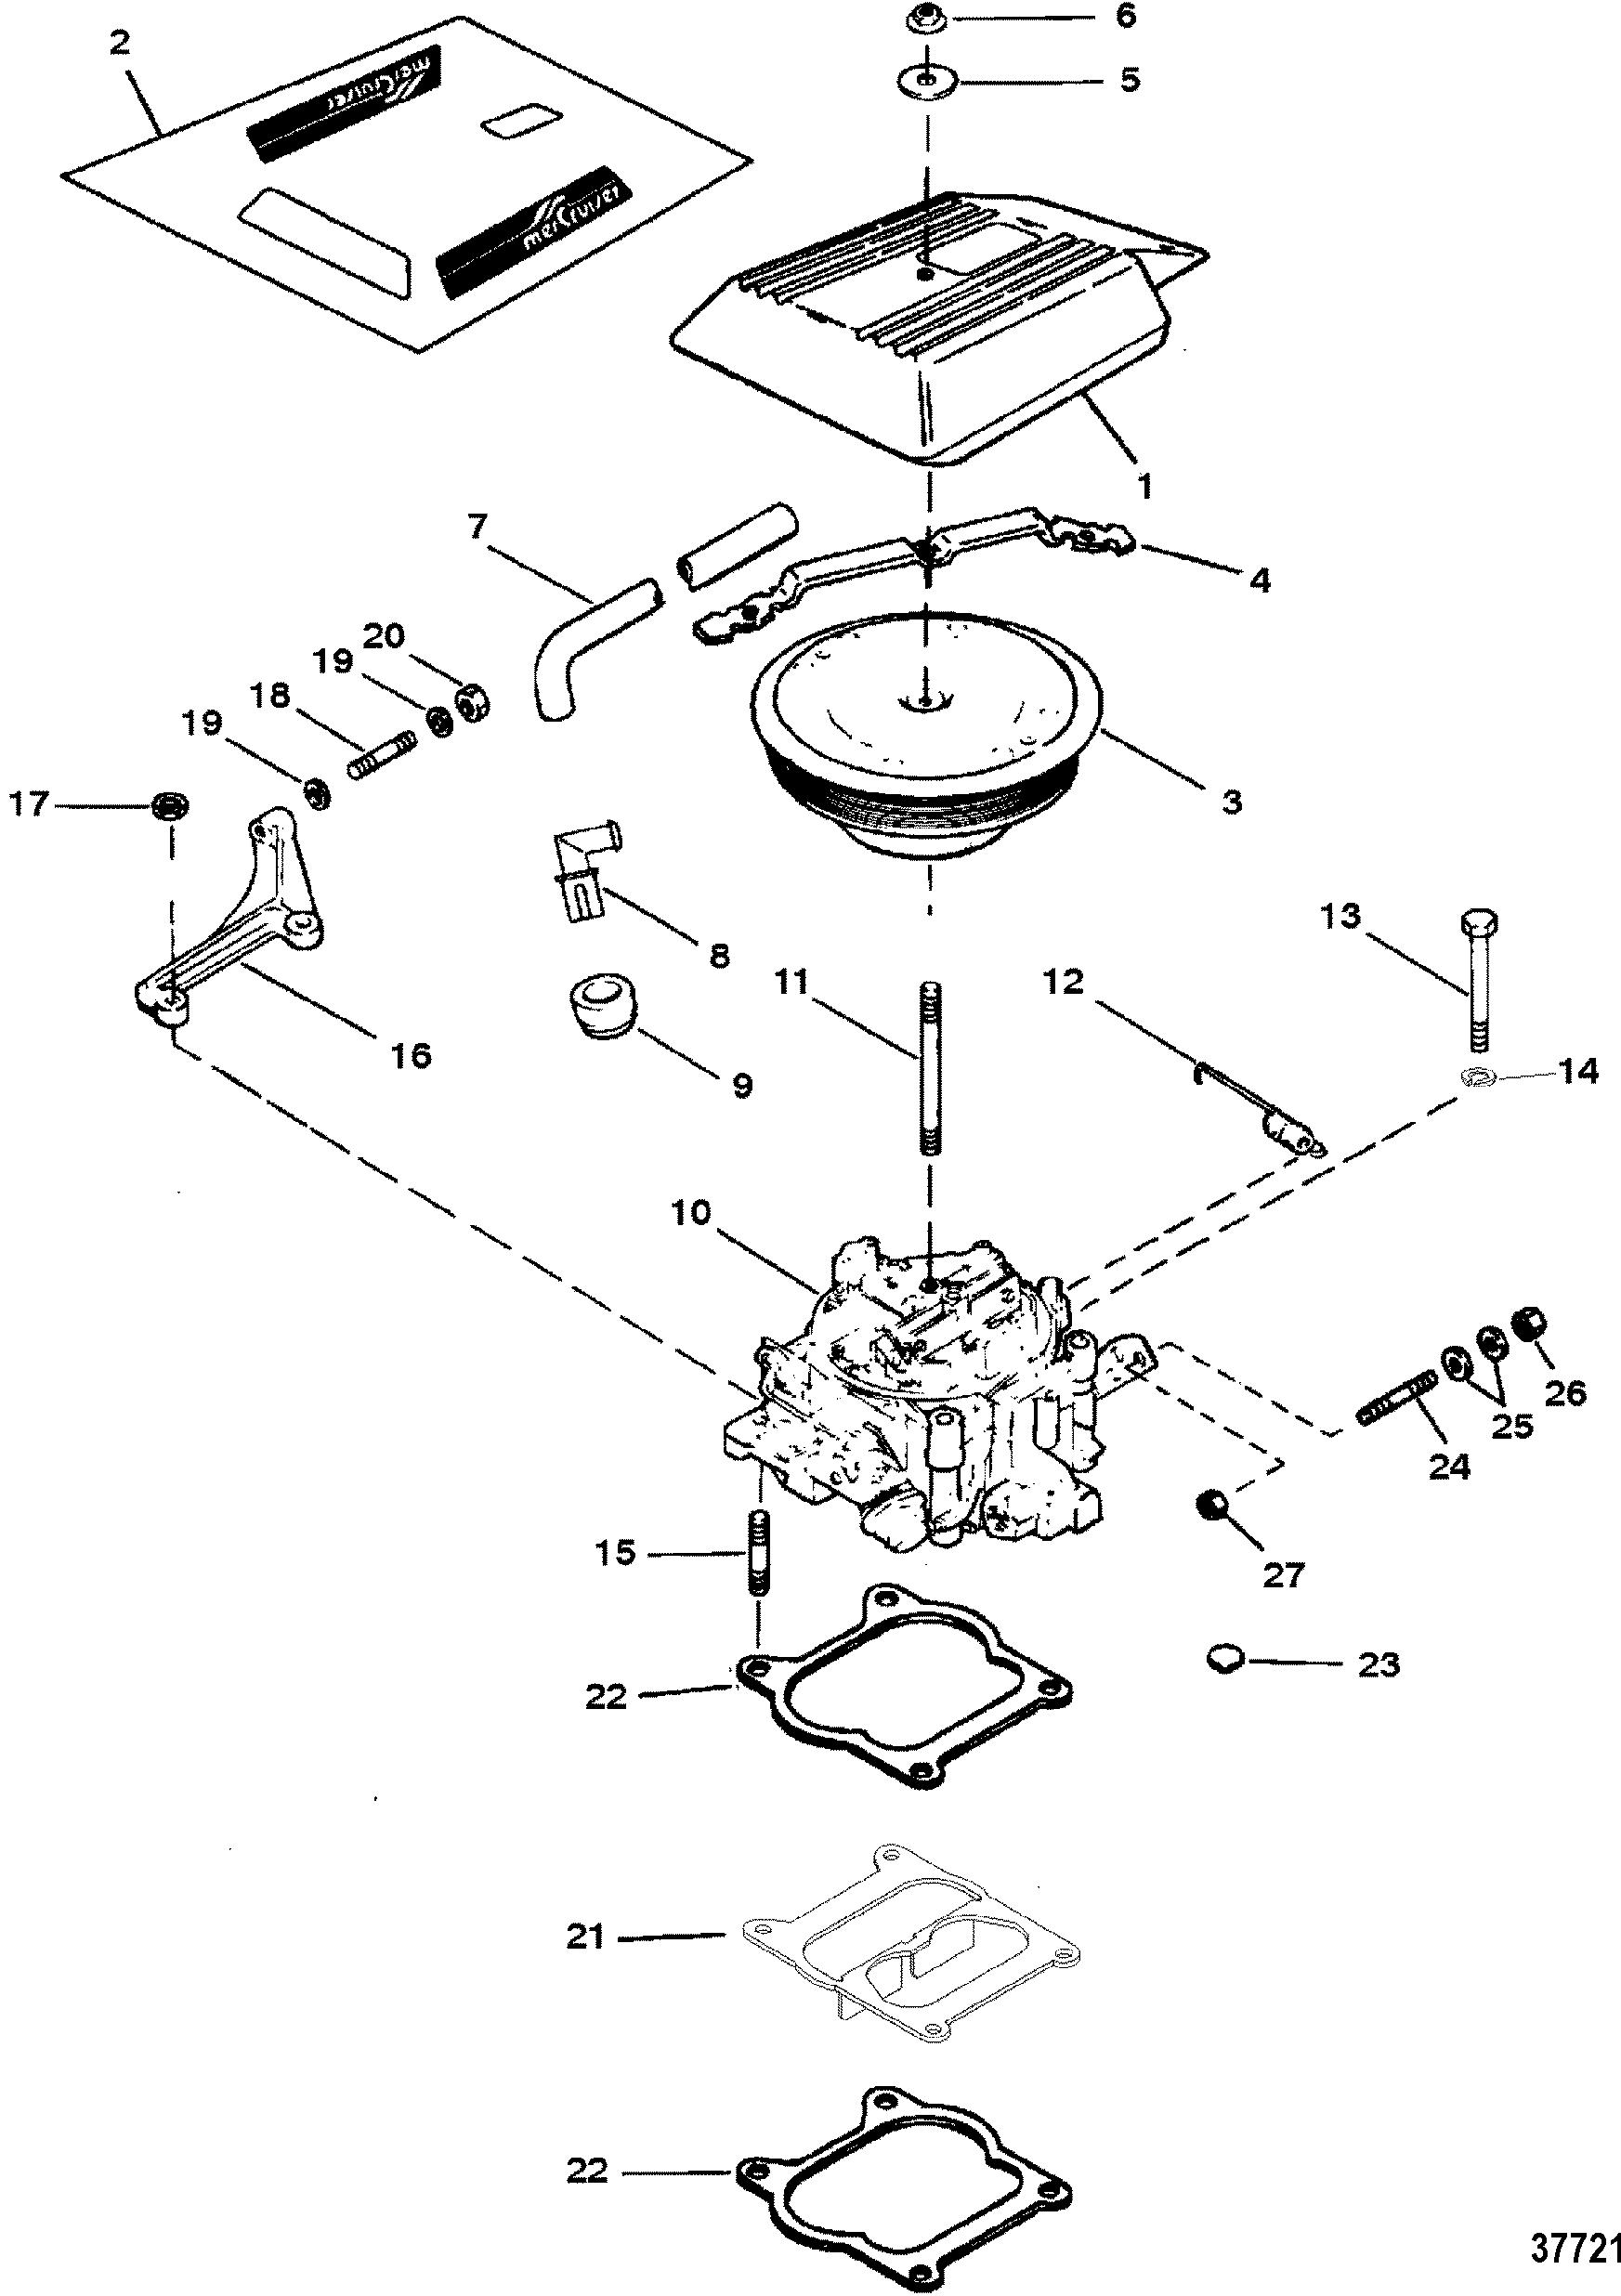 Carburetor Throttle Linkage 4 Barrel For Mercruiser 5 7l